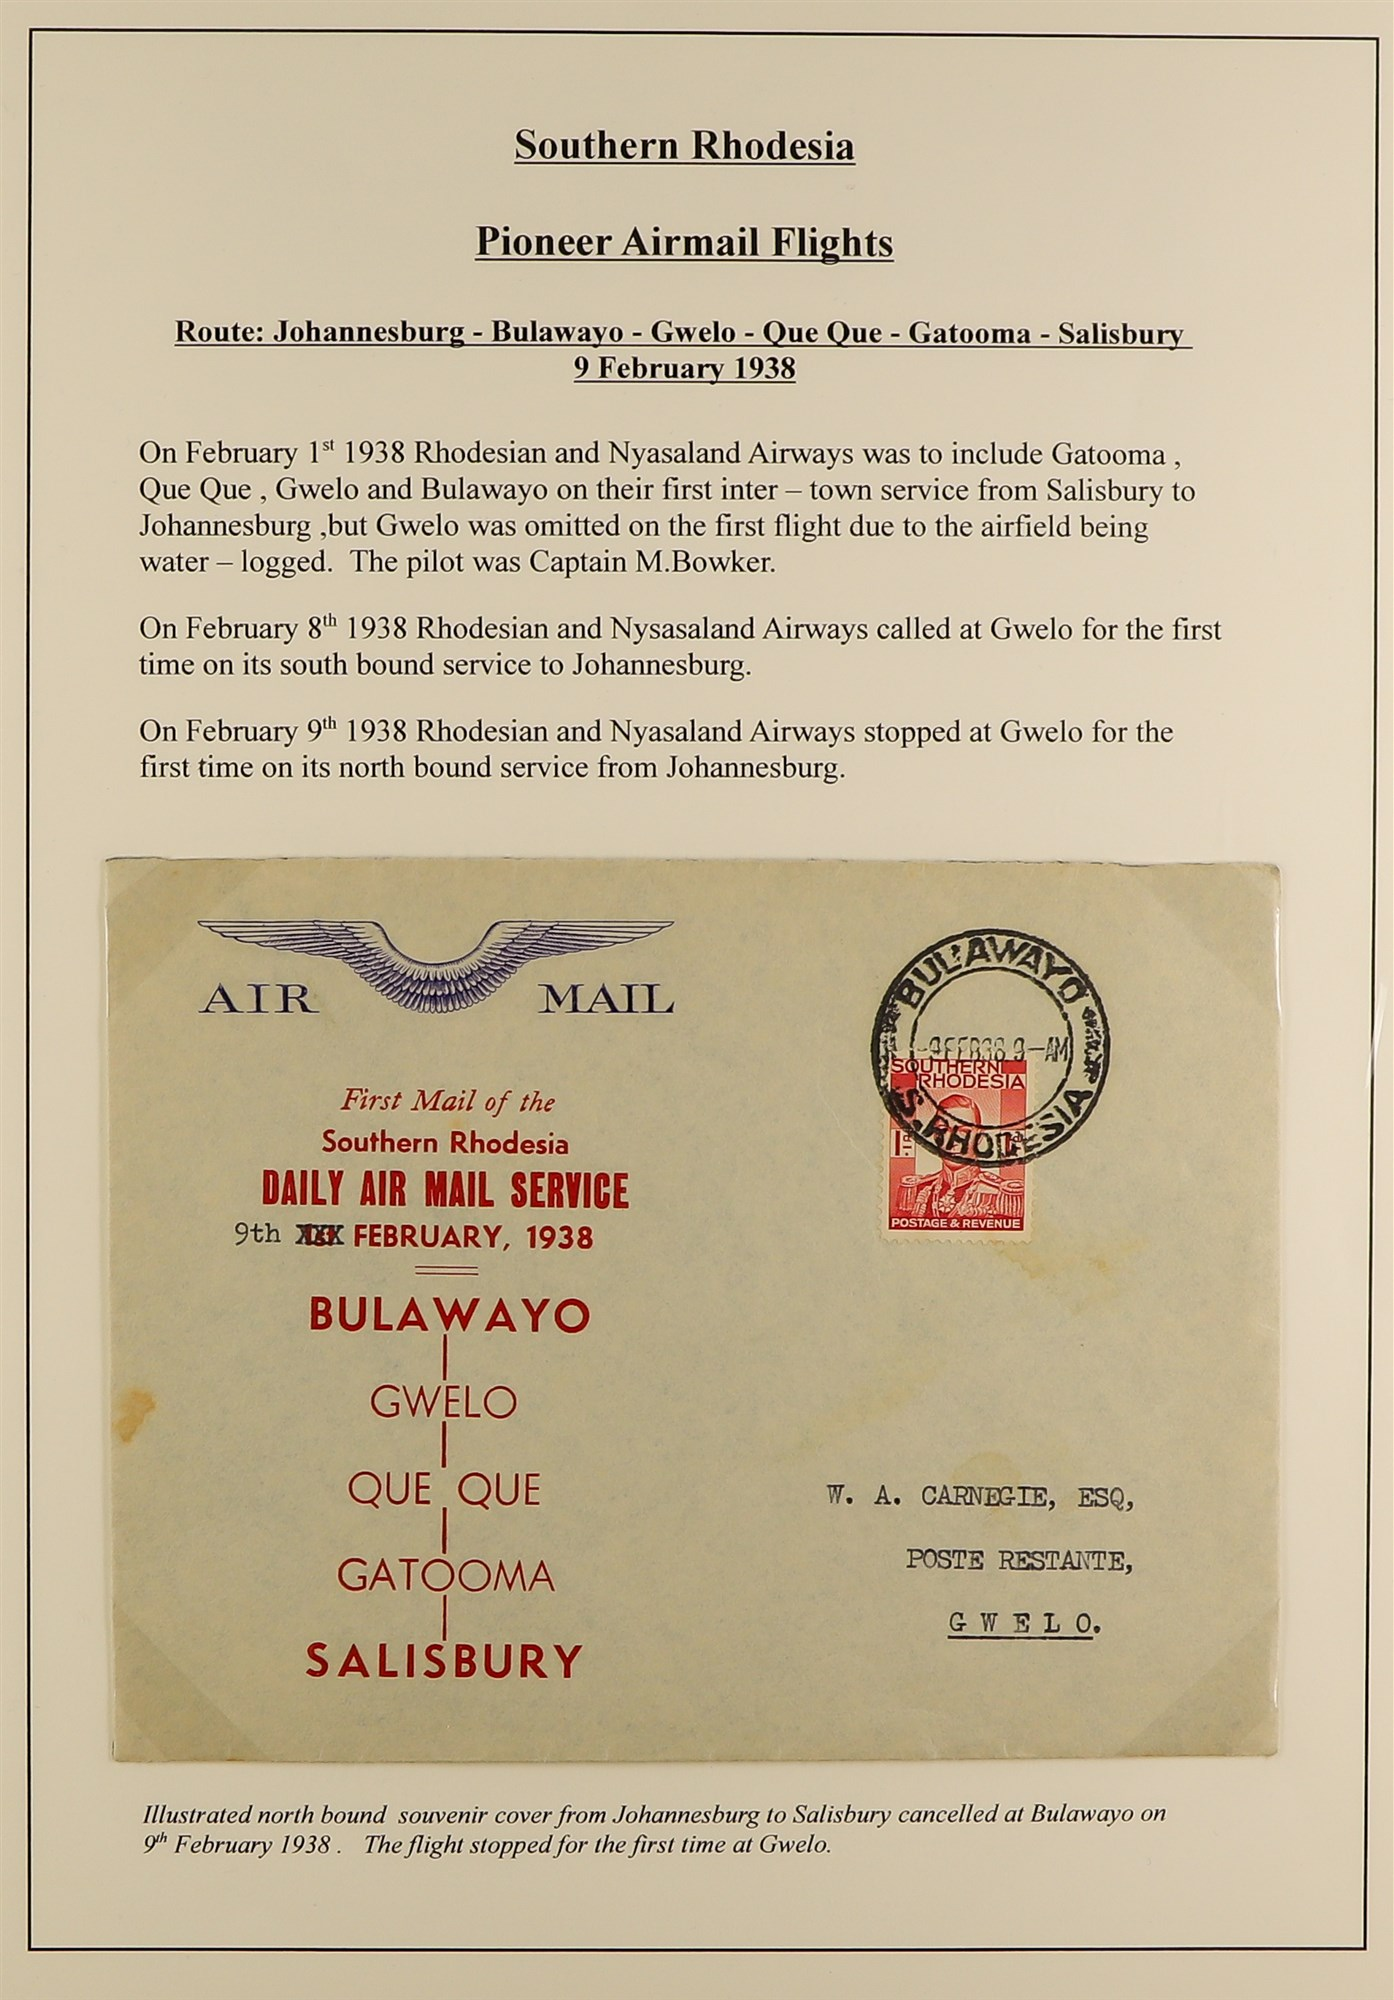 RHODESIA AIRMAIL COVERS COLLECTION 1930's-60's with Rhodesian & Nyasaland Airways (15), Nyasaland- - Image 6 of 10